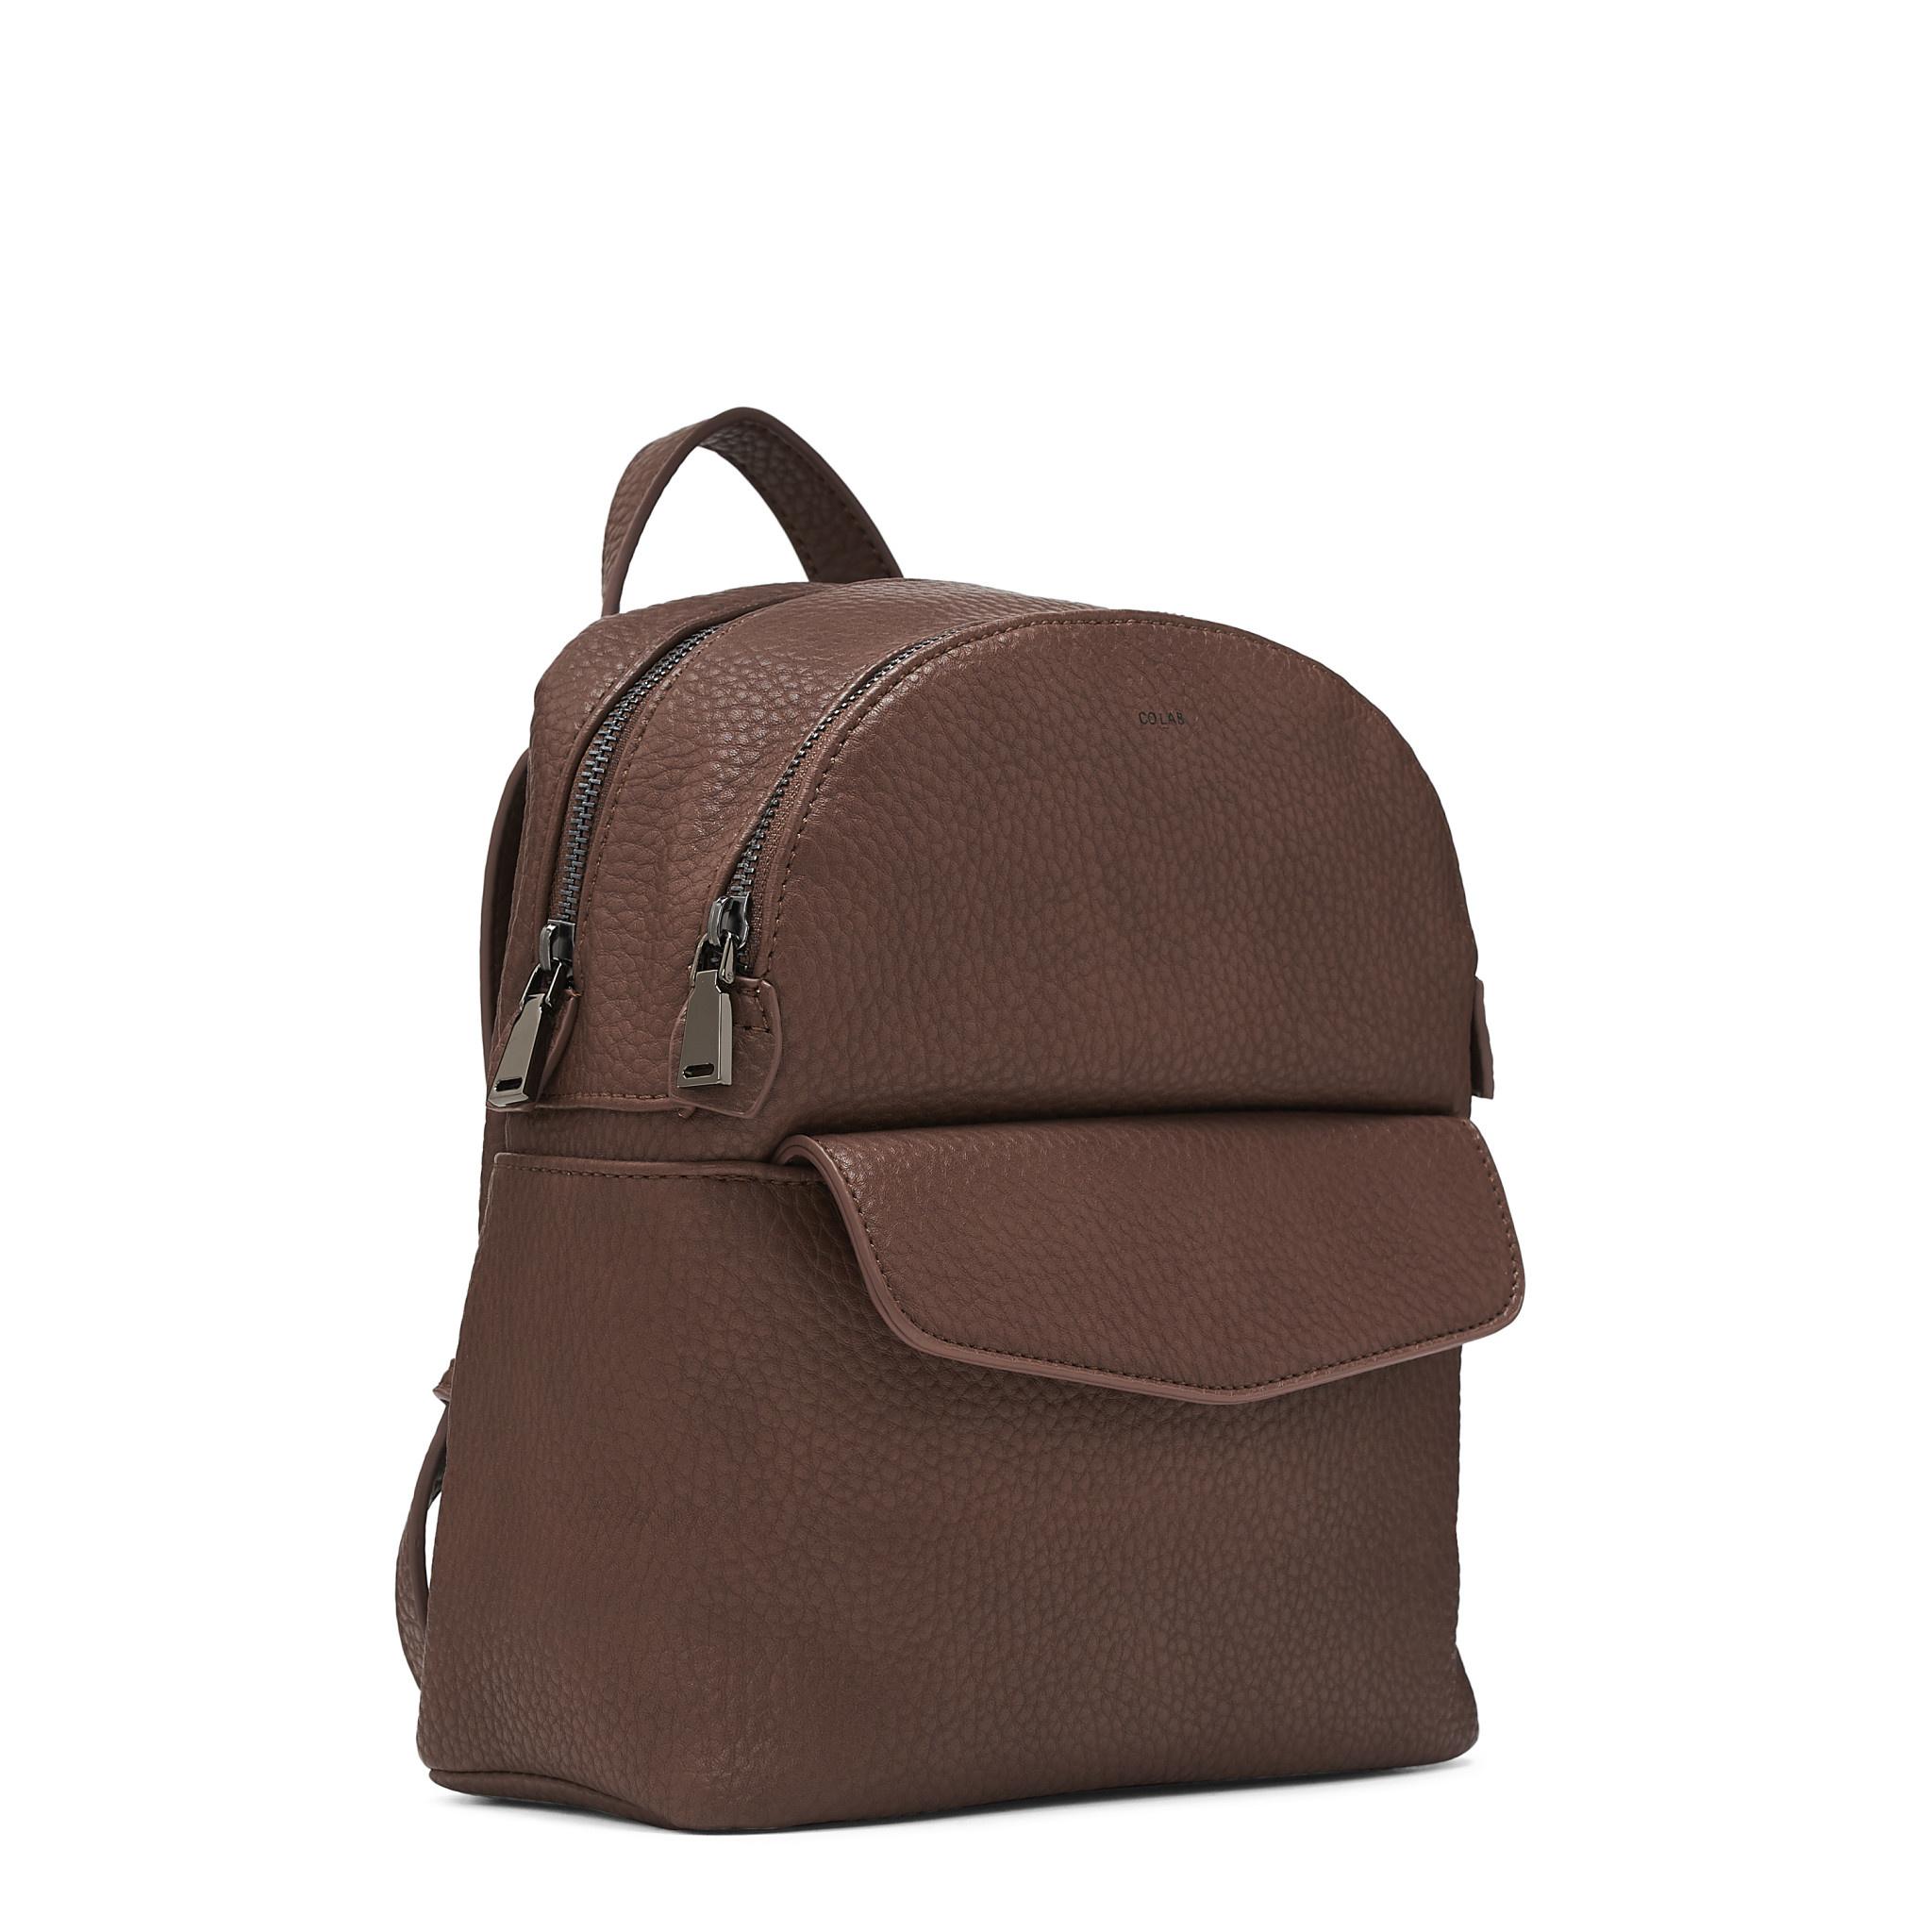 Colab Colab Pebble P.U. Mini Backpack (#6336) - Oak